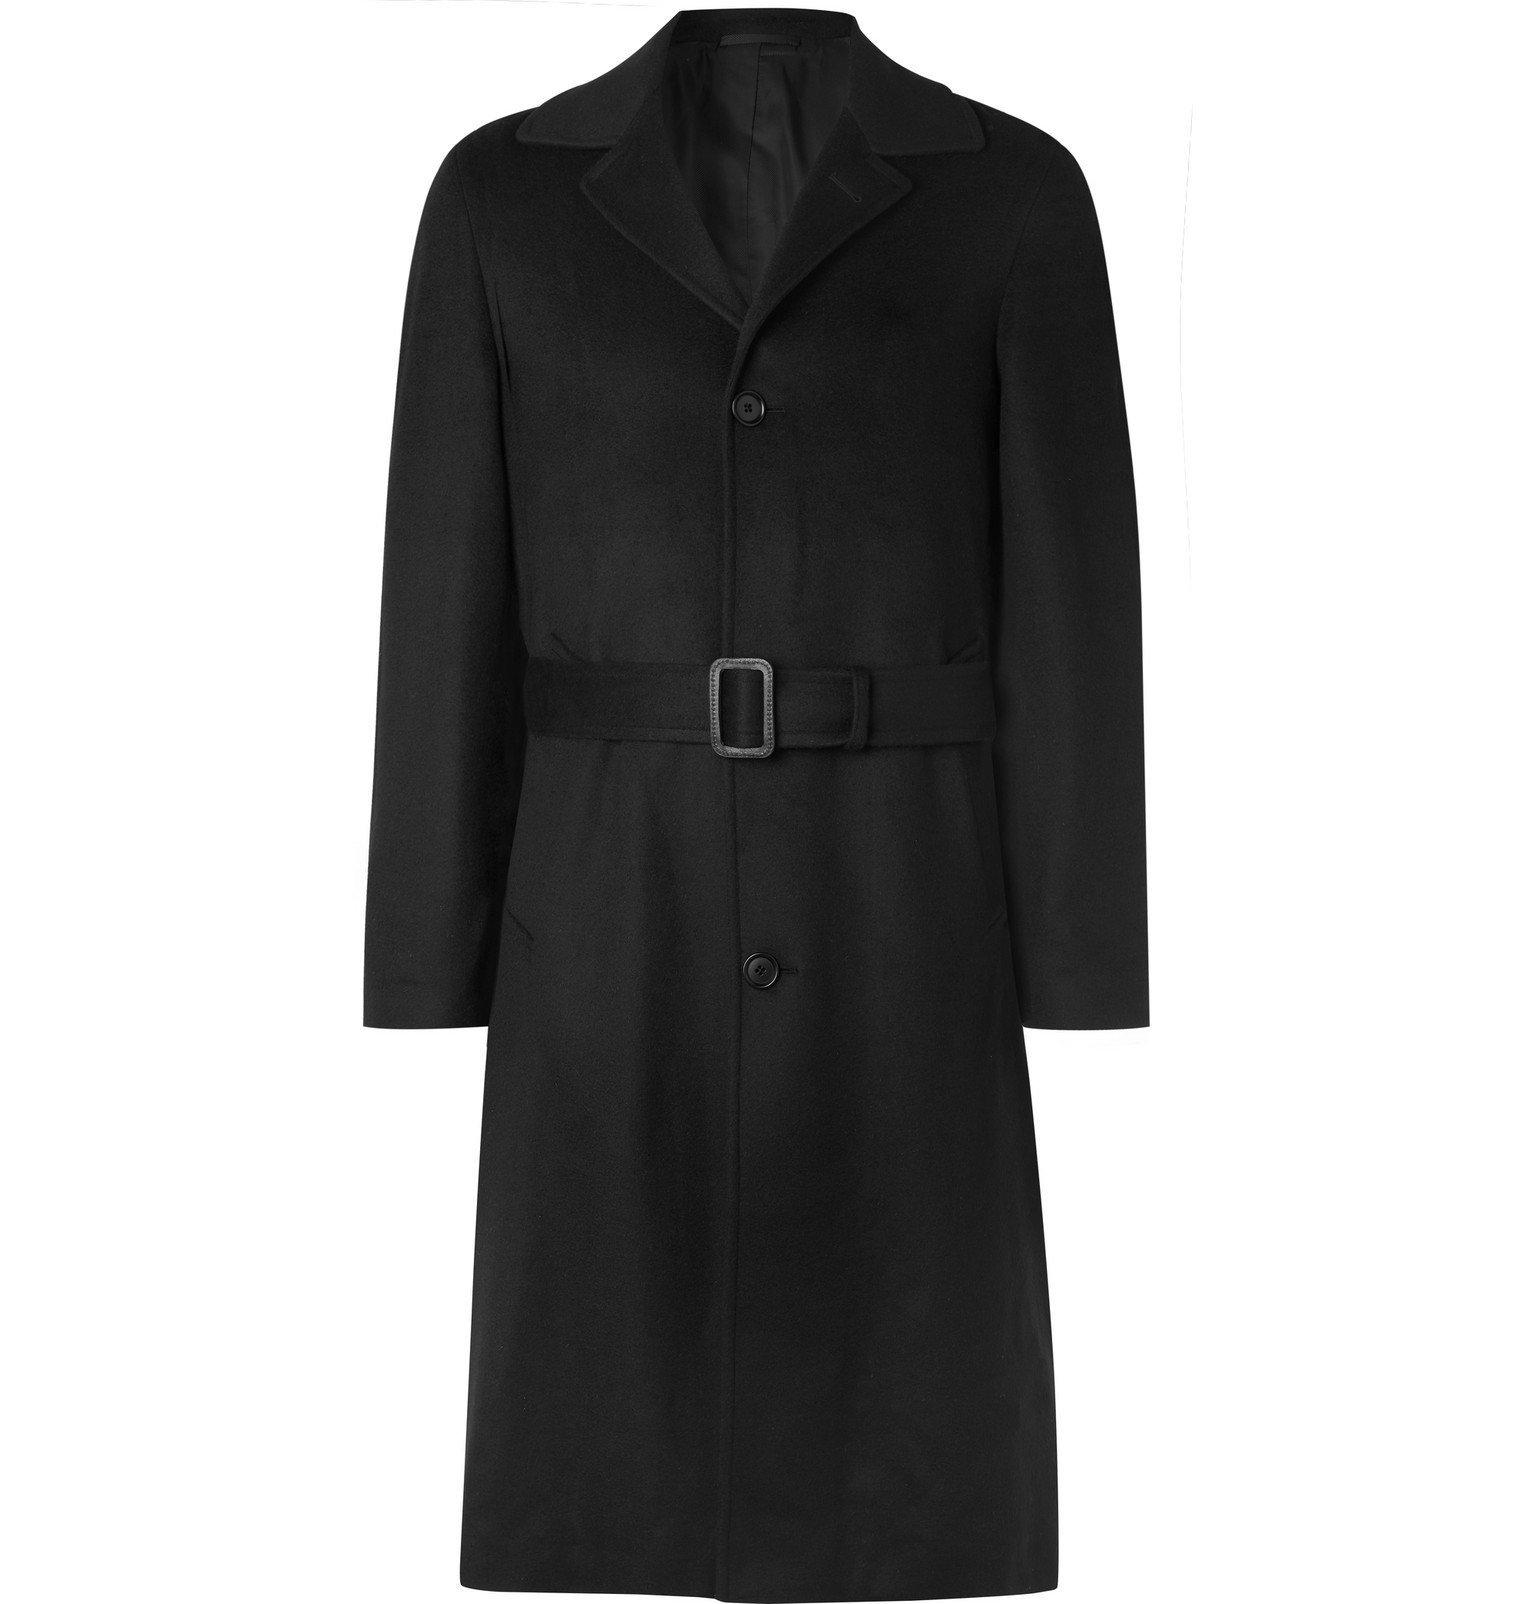 Saman Amel - Wool and Cashmere-Blend Coat - Black